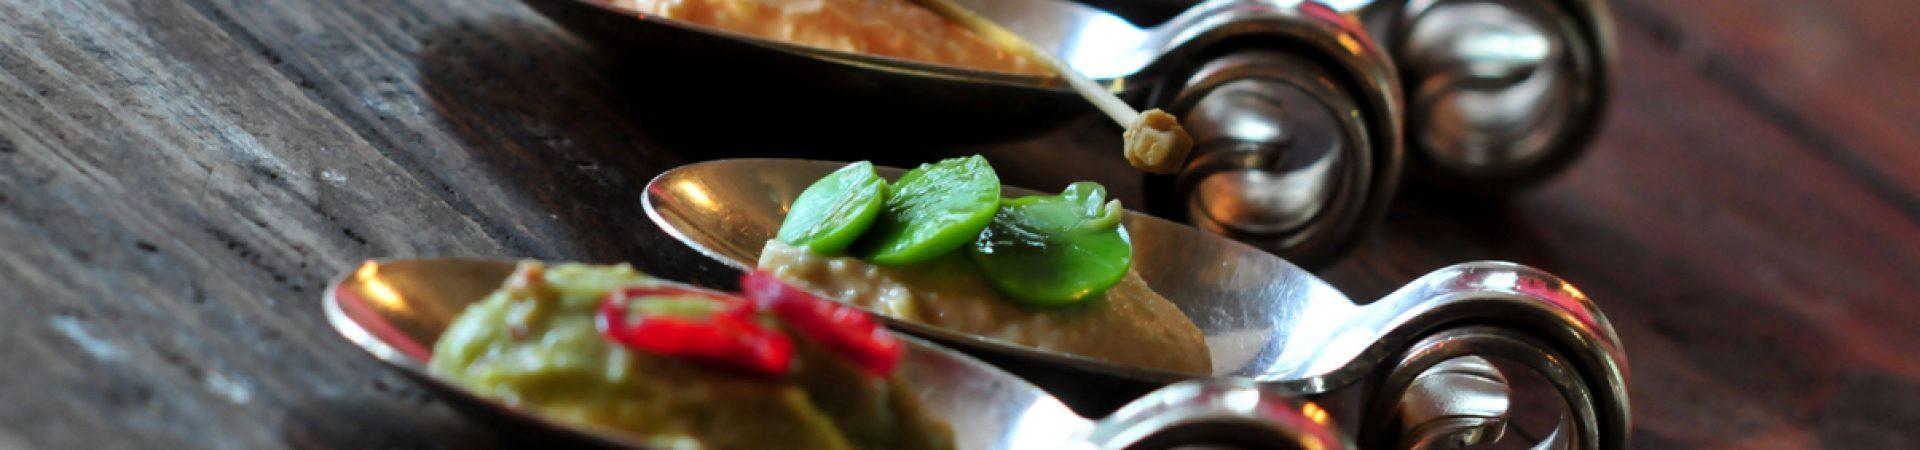 cuisineinfernaleLR-5567